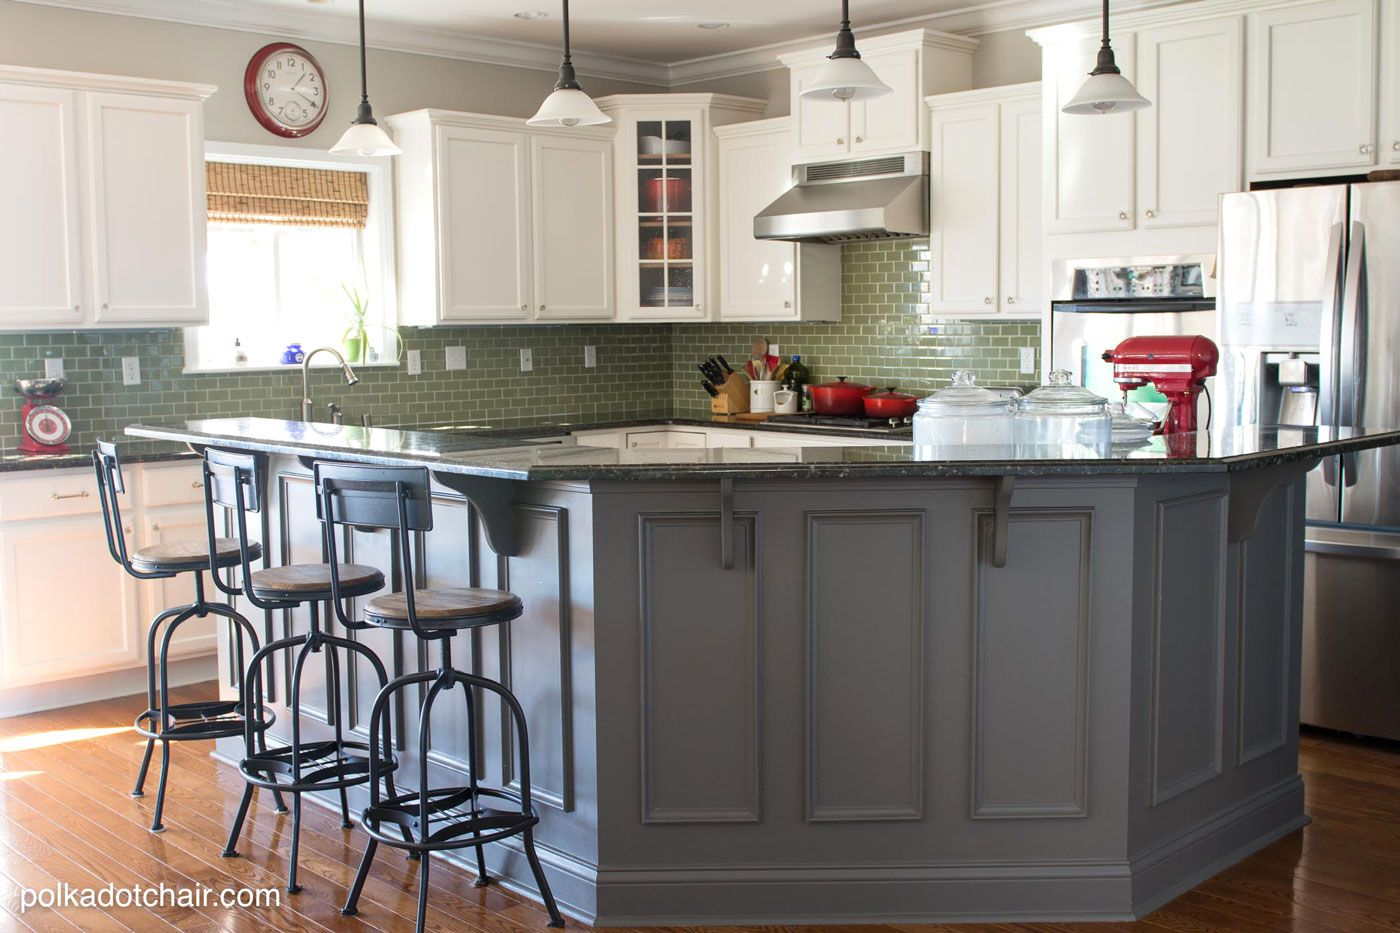 Paint Kitchen Cabinets Gray Kitchen Cabinet Paint Colors Benjamin Moore House Decor